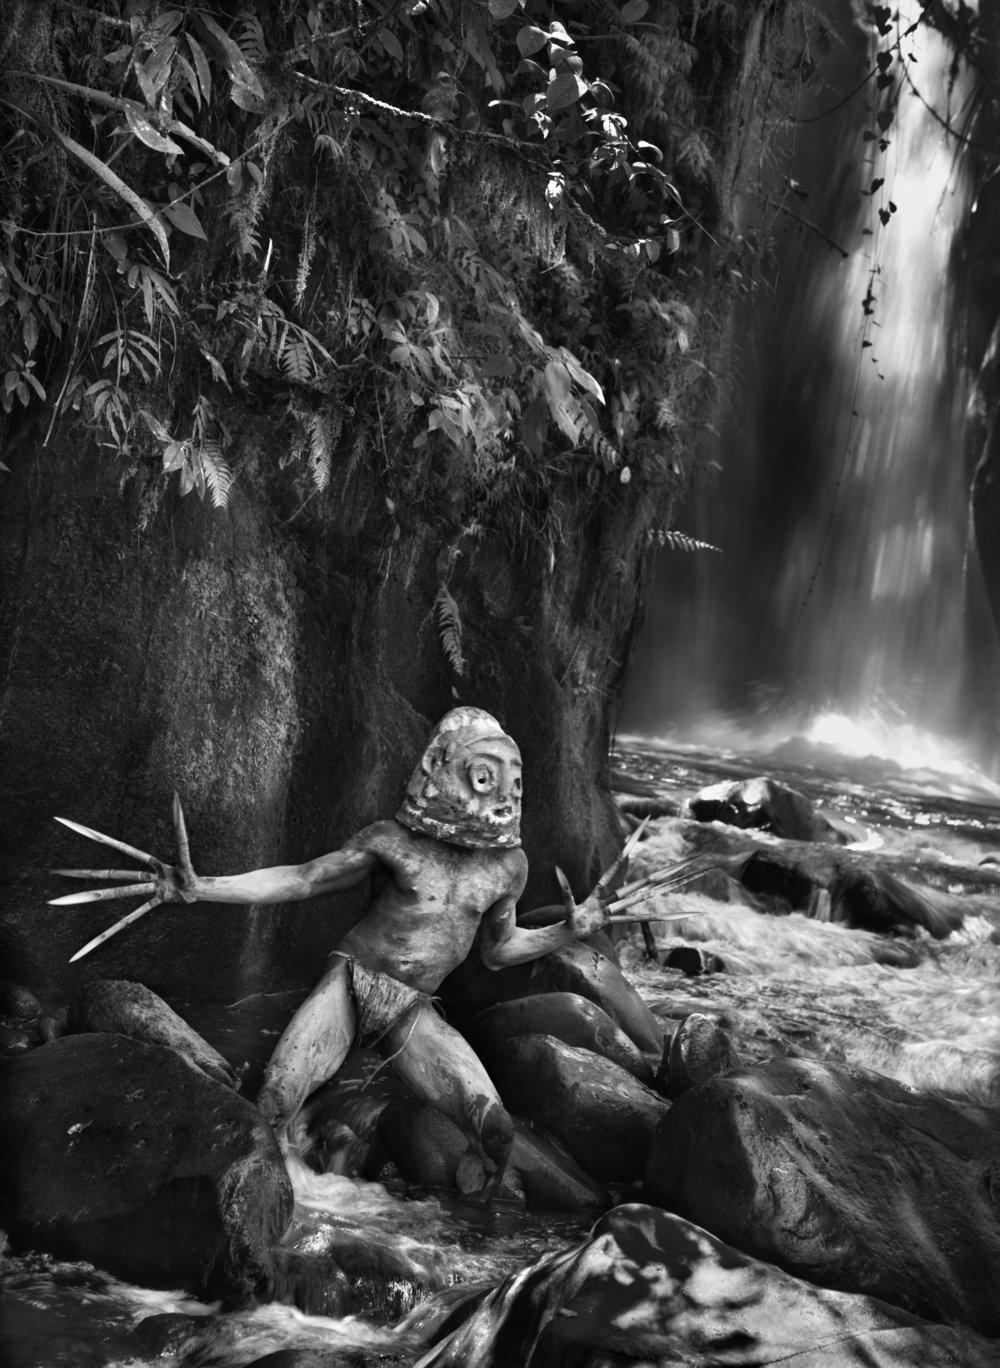 SEBASTIAO SALGADO,Asaro, Papua New Guinea, 2008